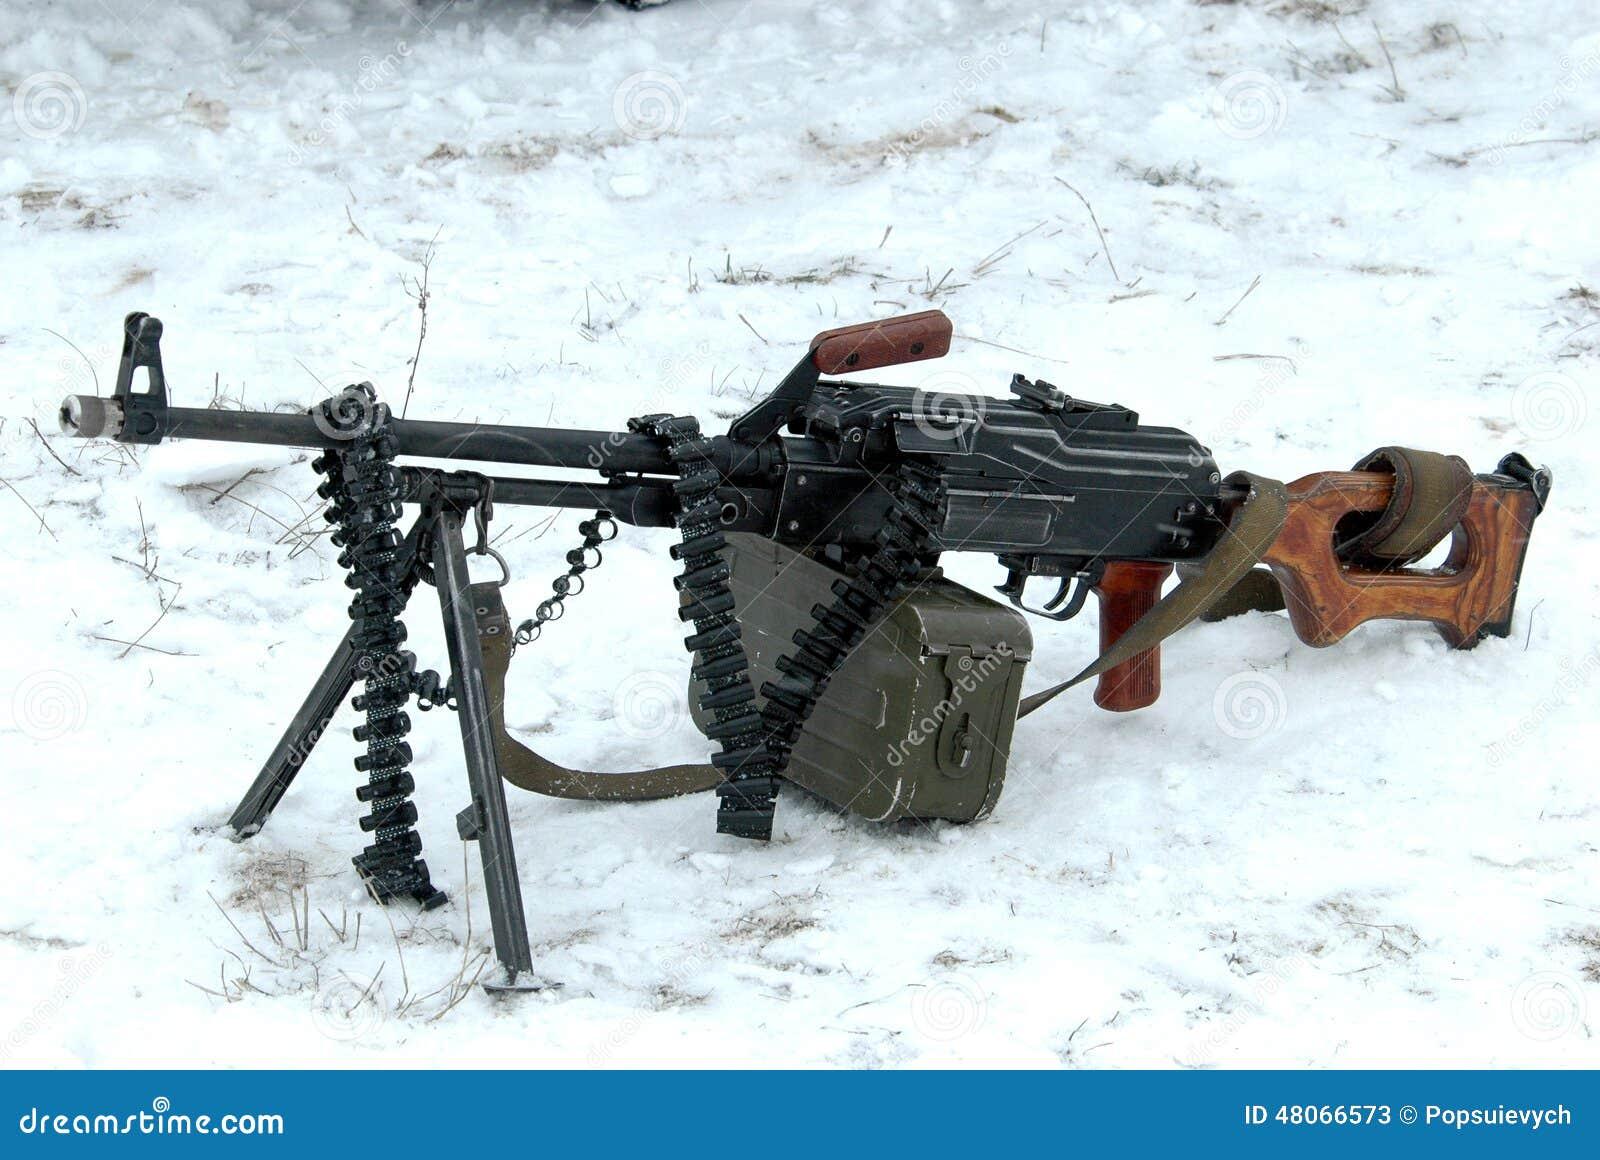 PKP Pecheng, la ametralladora rusa Ametralladora-pkm-48066573